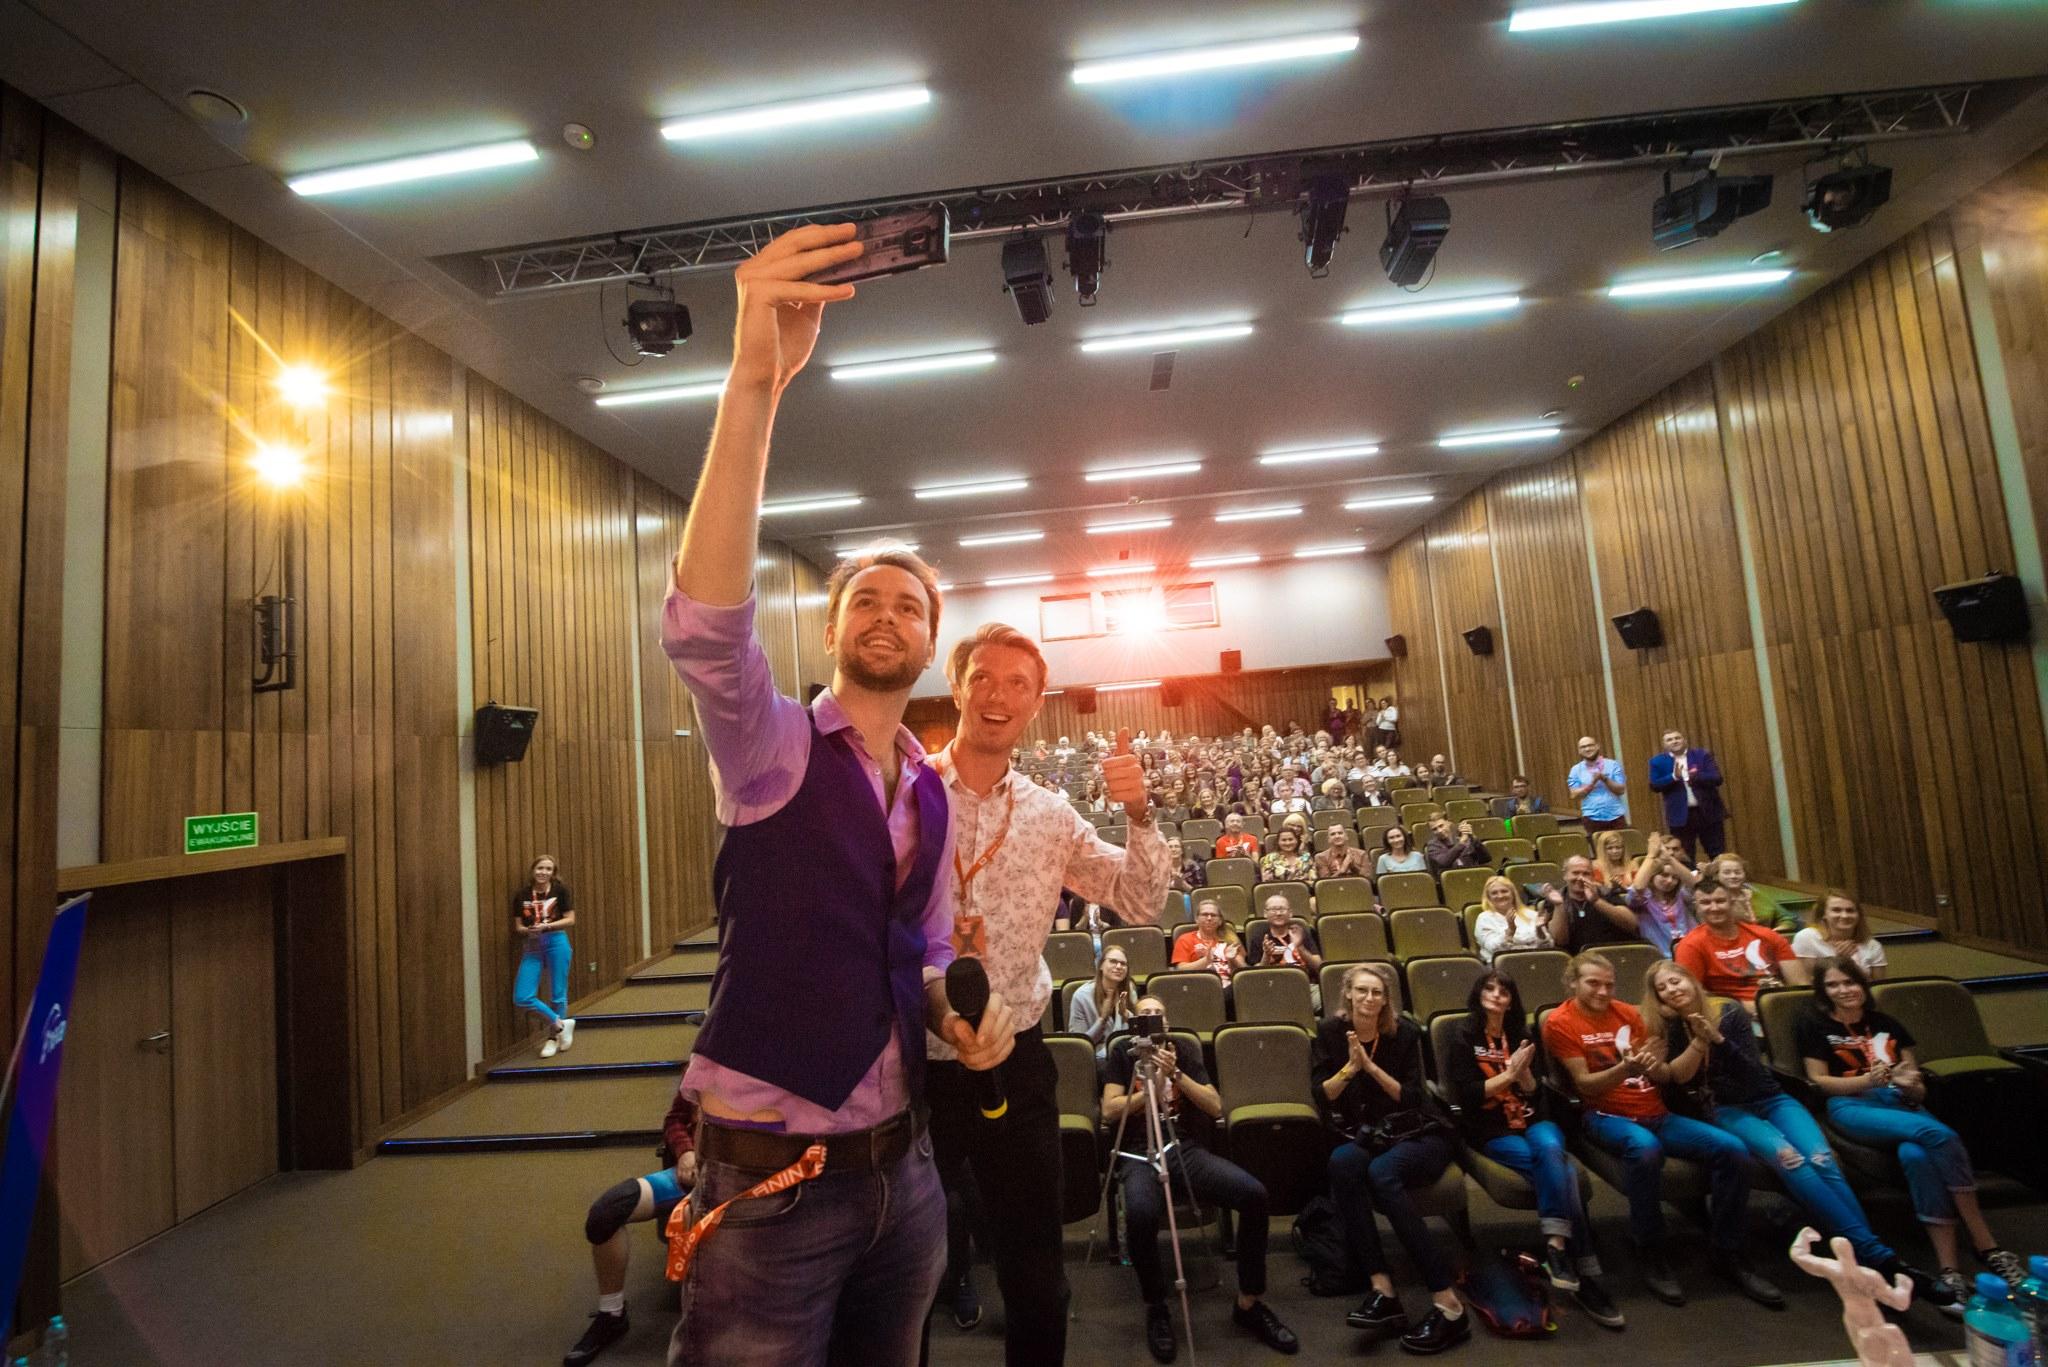 Solanin Film Festiwal - Foto